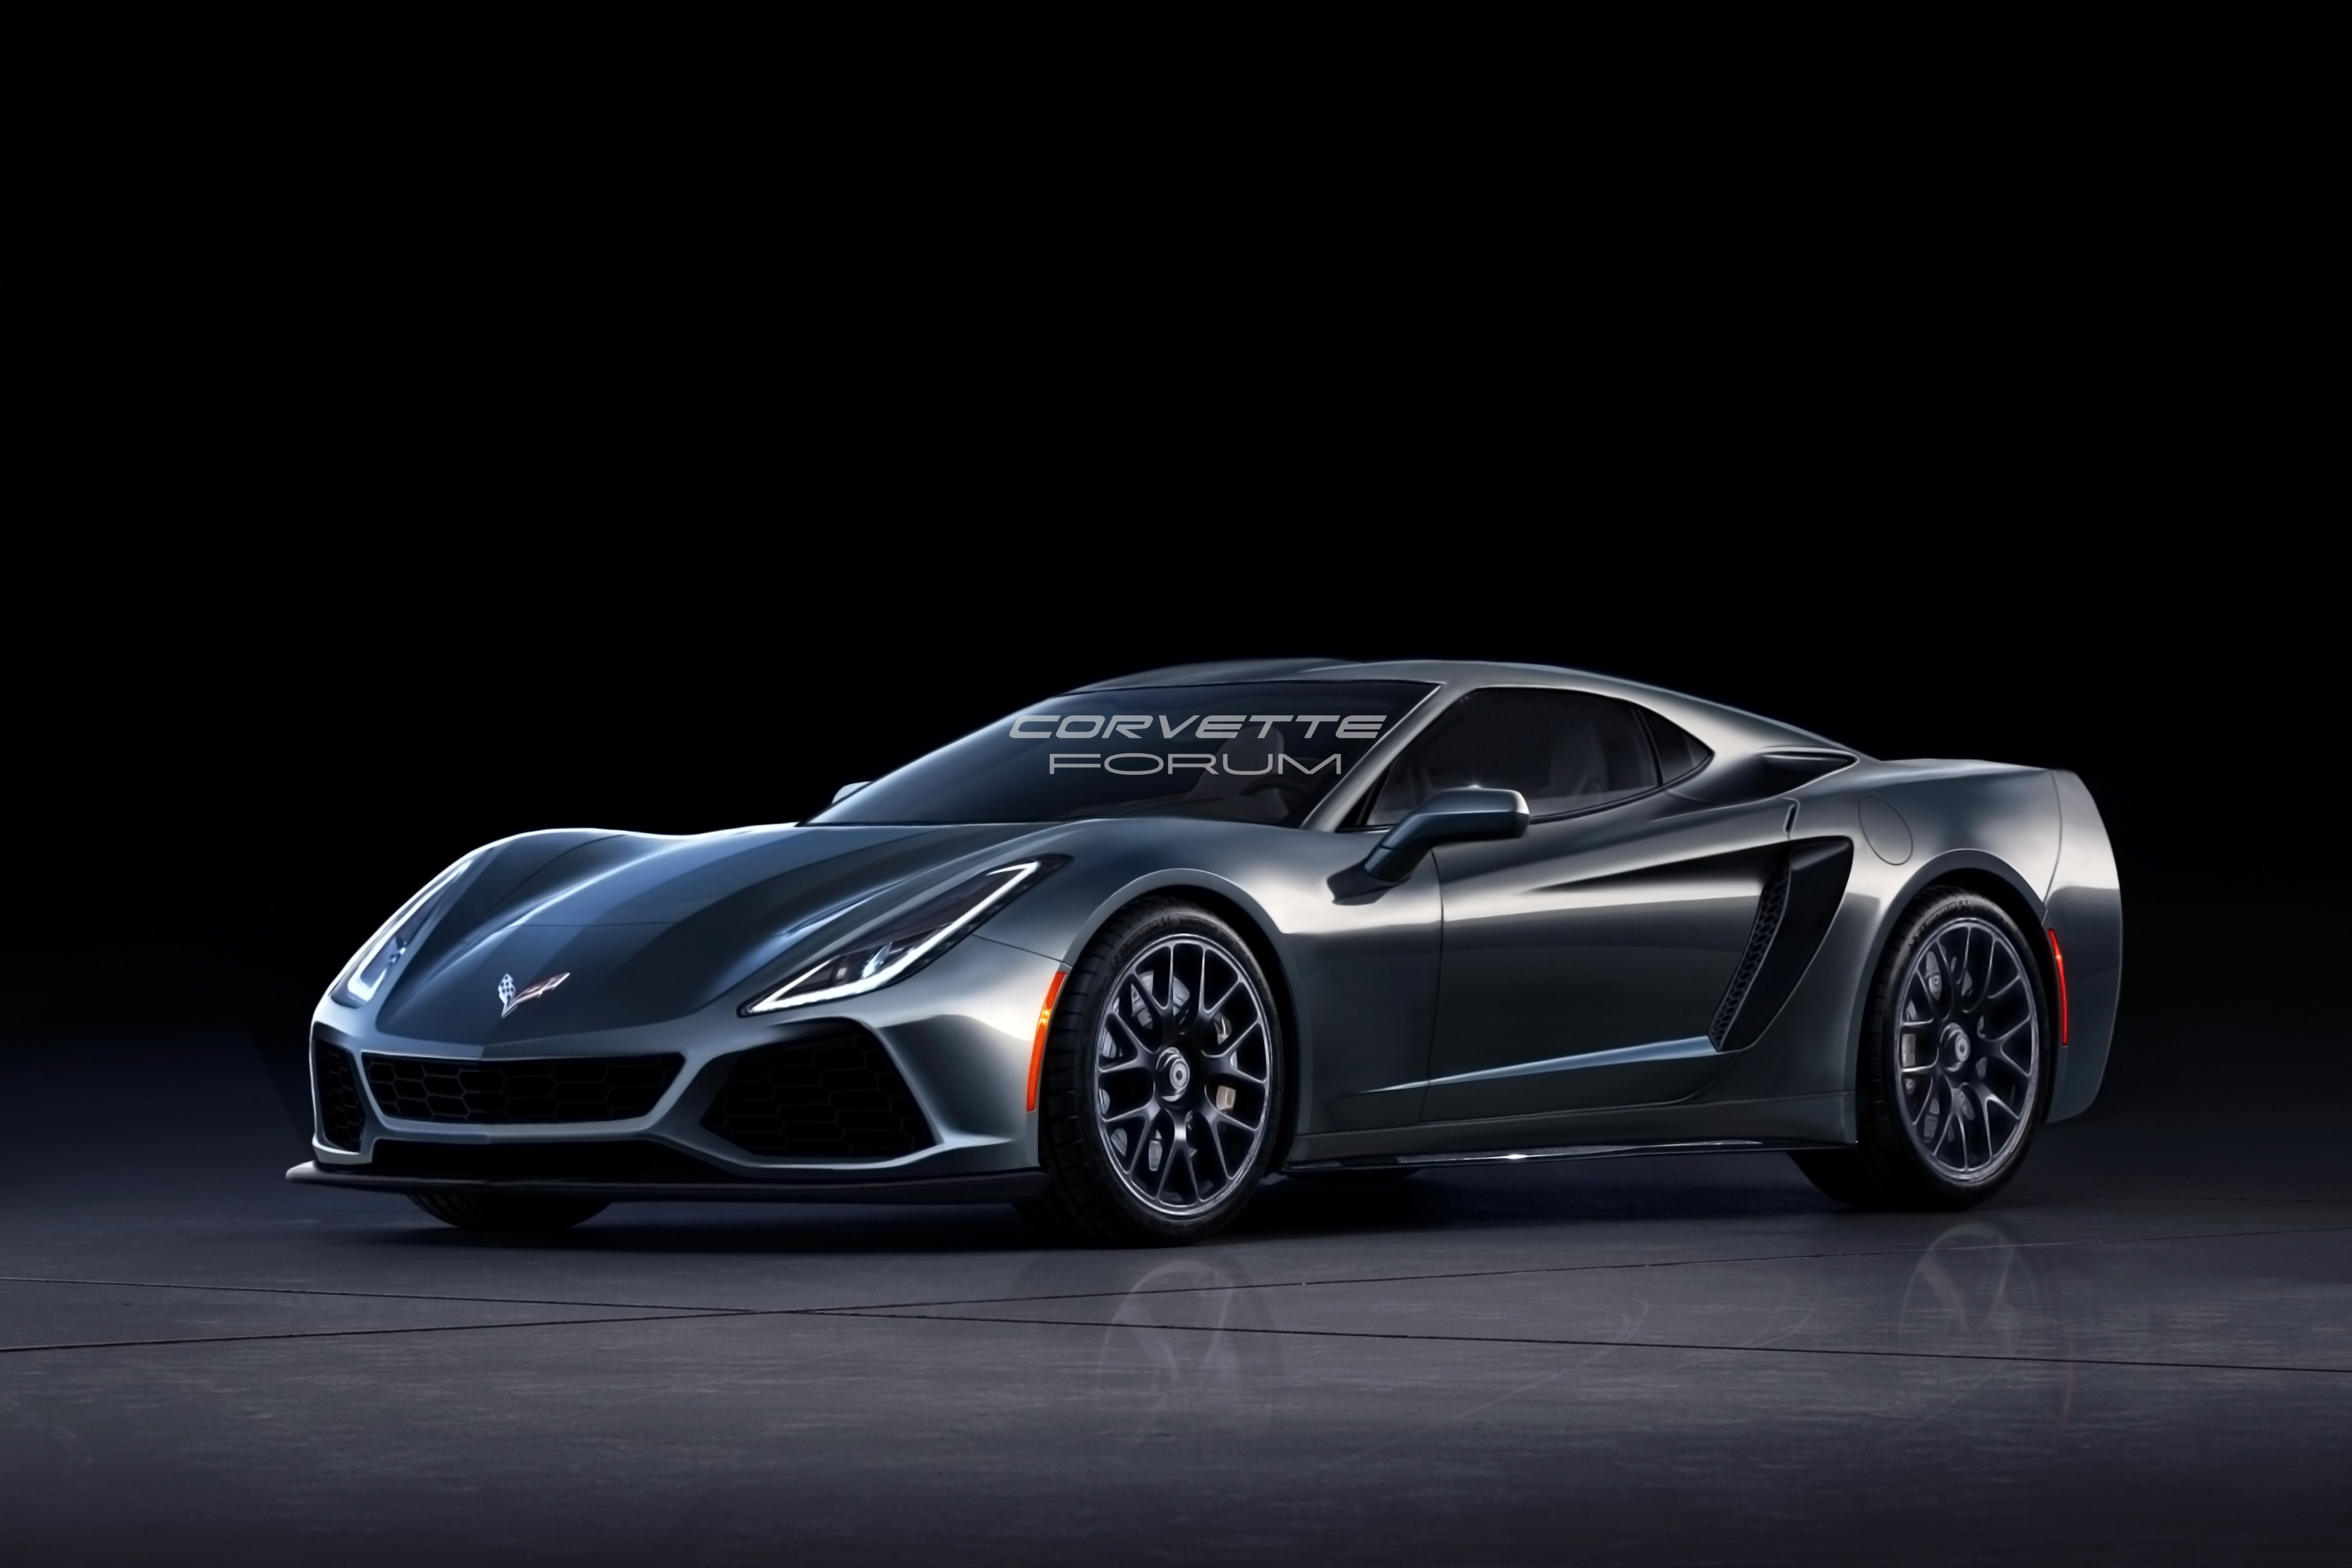 c8 corvette engine size